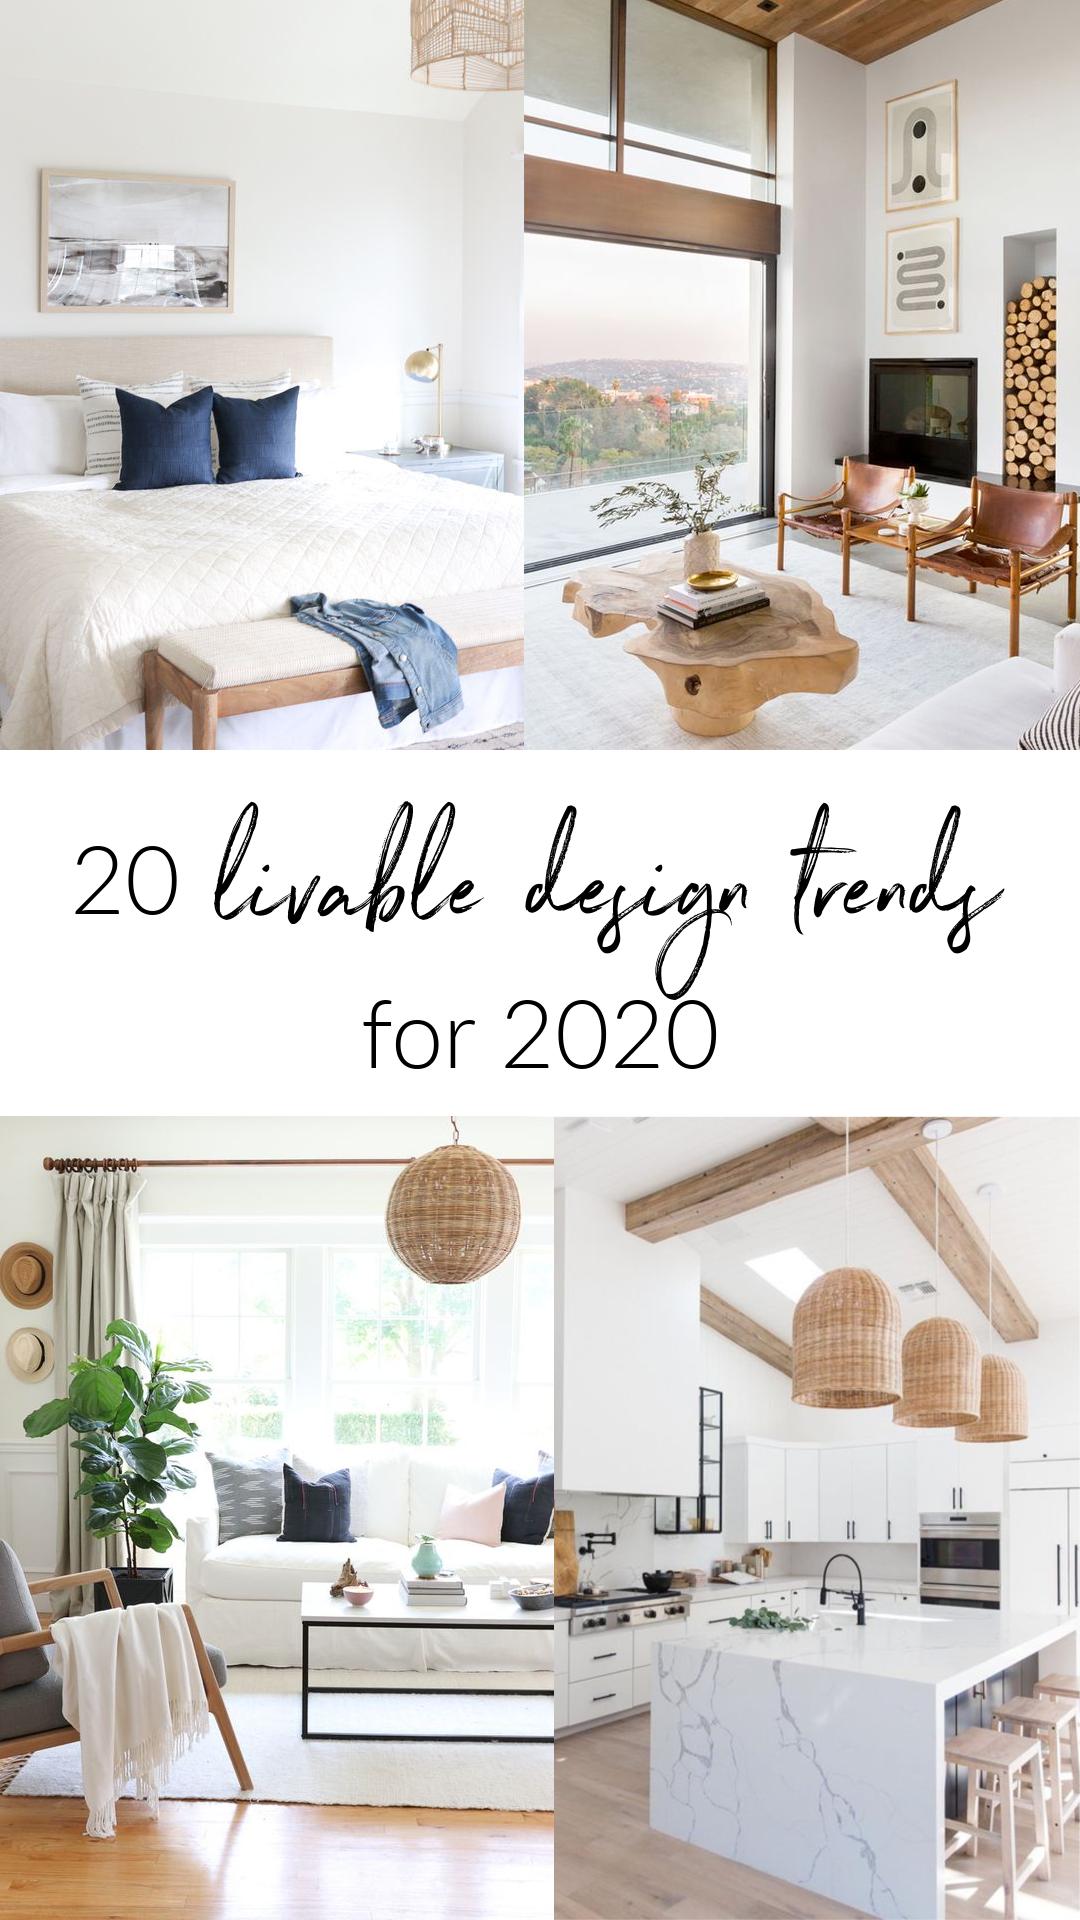 20 Livable Home Design Trends Of 2020 In 2020 Trending Decor Home Decor Trends Interior Design Trends